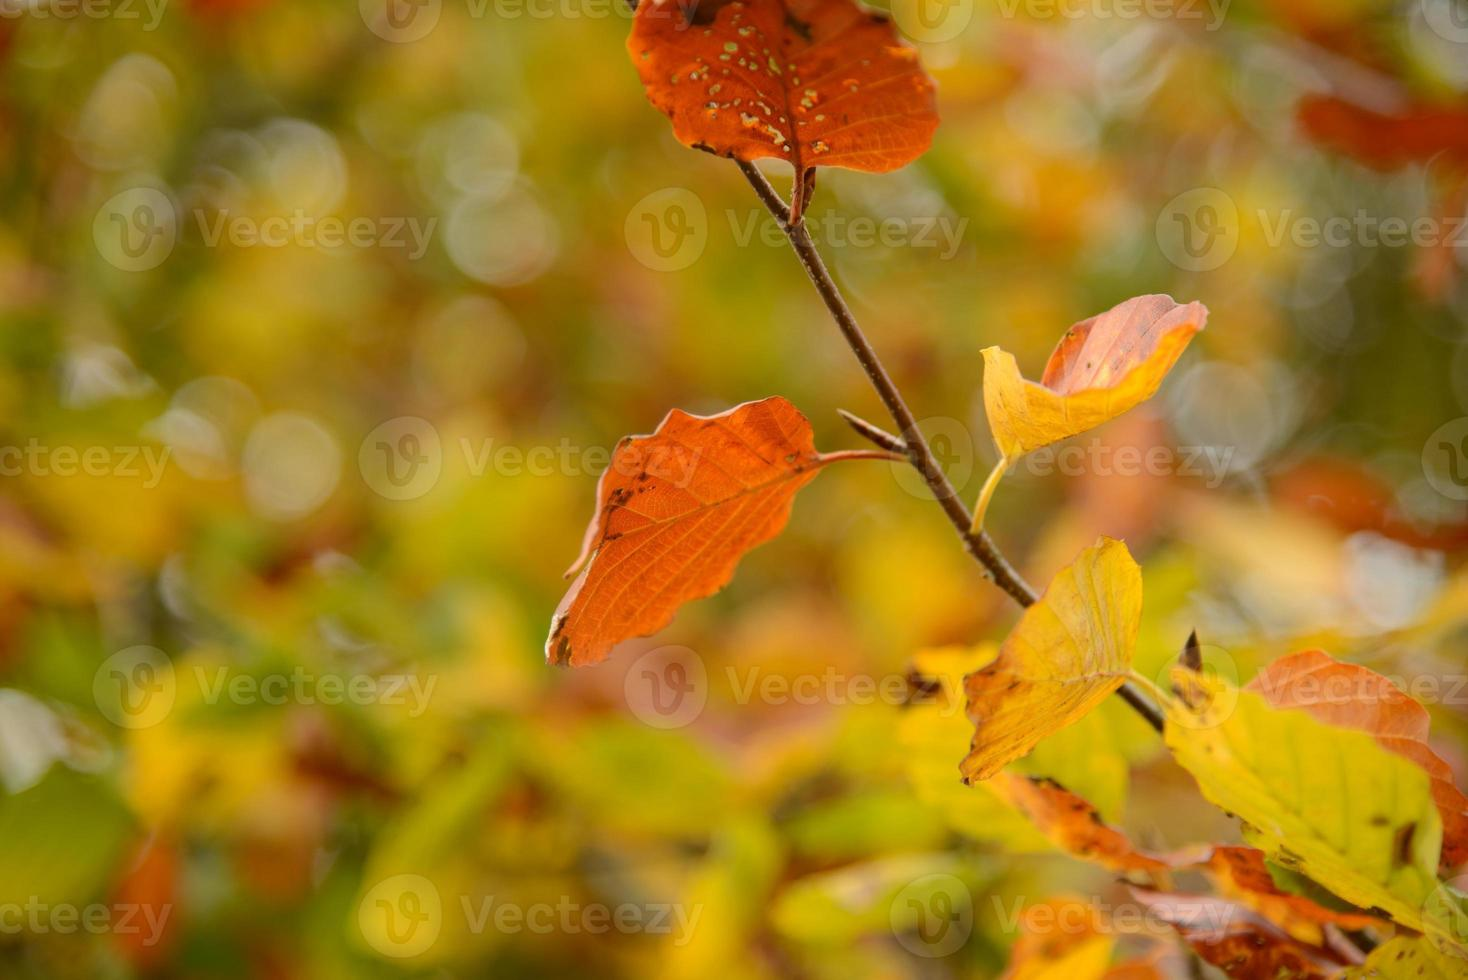 Herbstfarben aus nächster Nähe foto